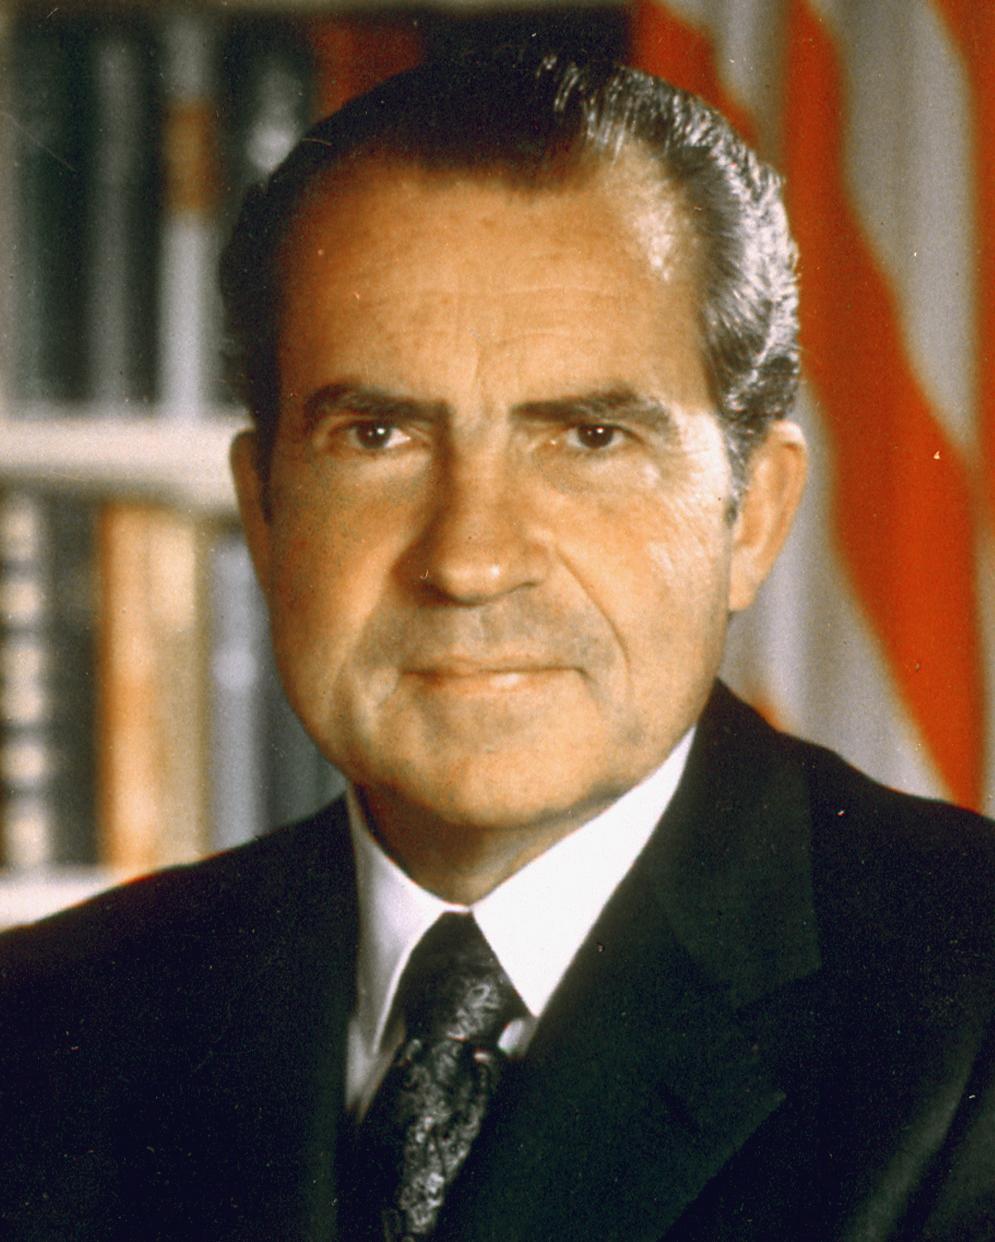 Nixon: File:Richard M. Nixon 30-0316M Original (cropped).jpg